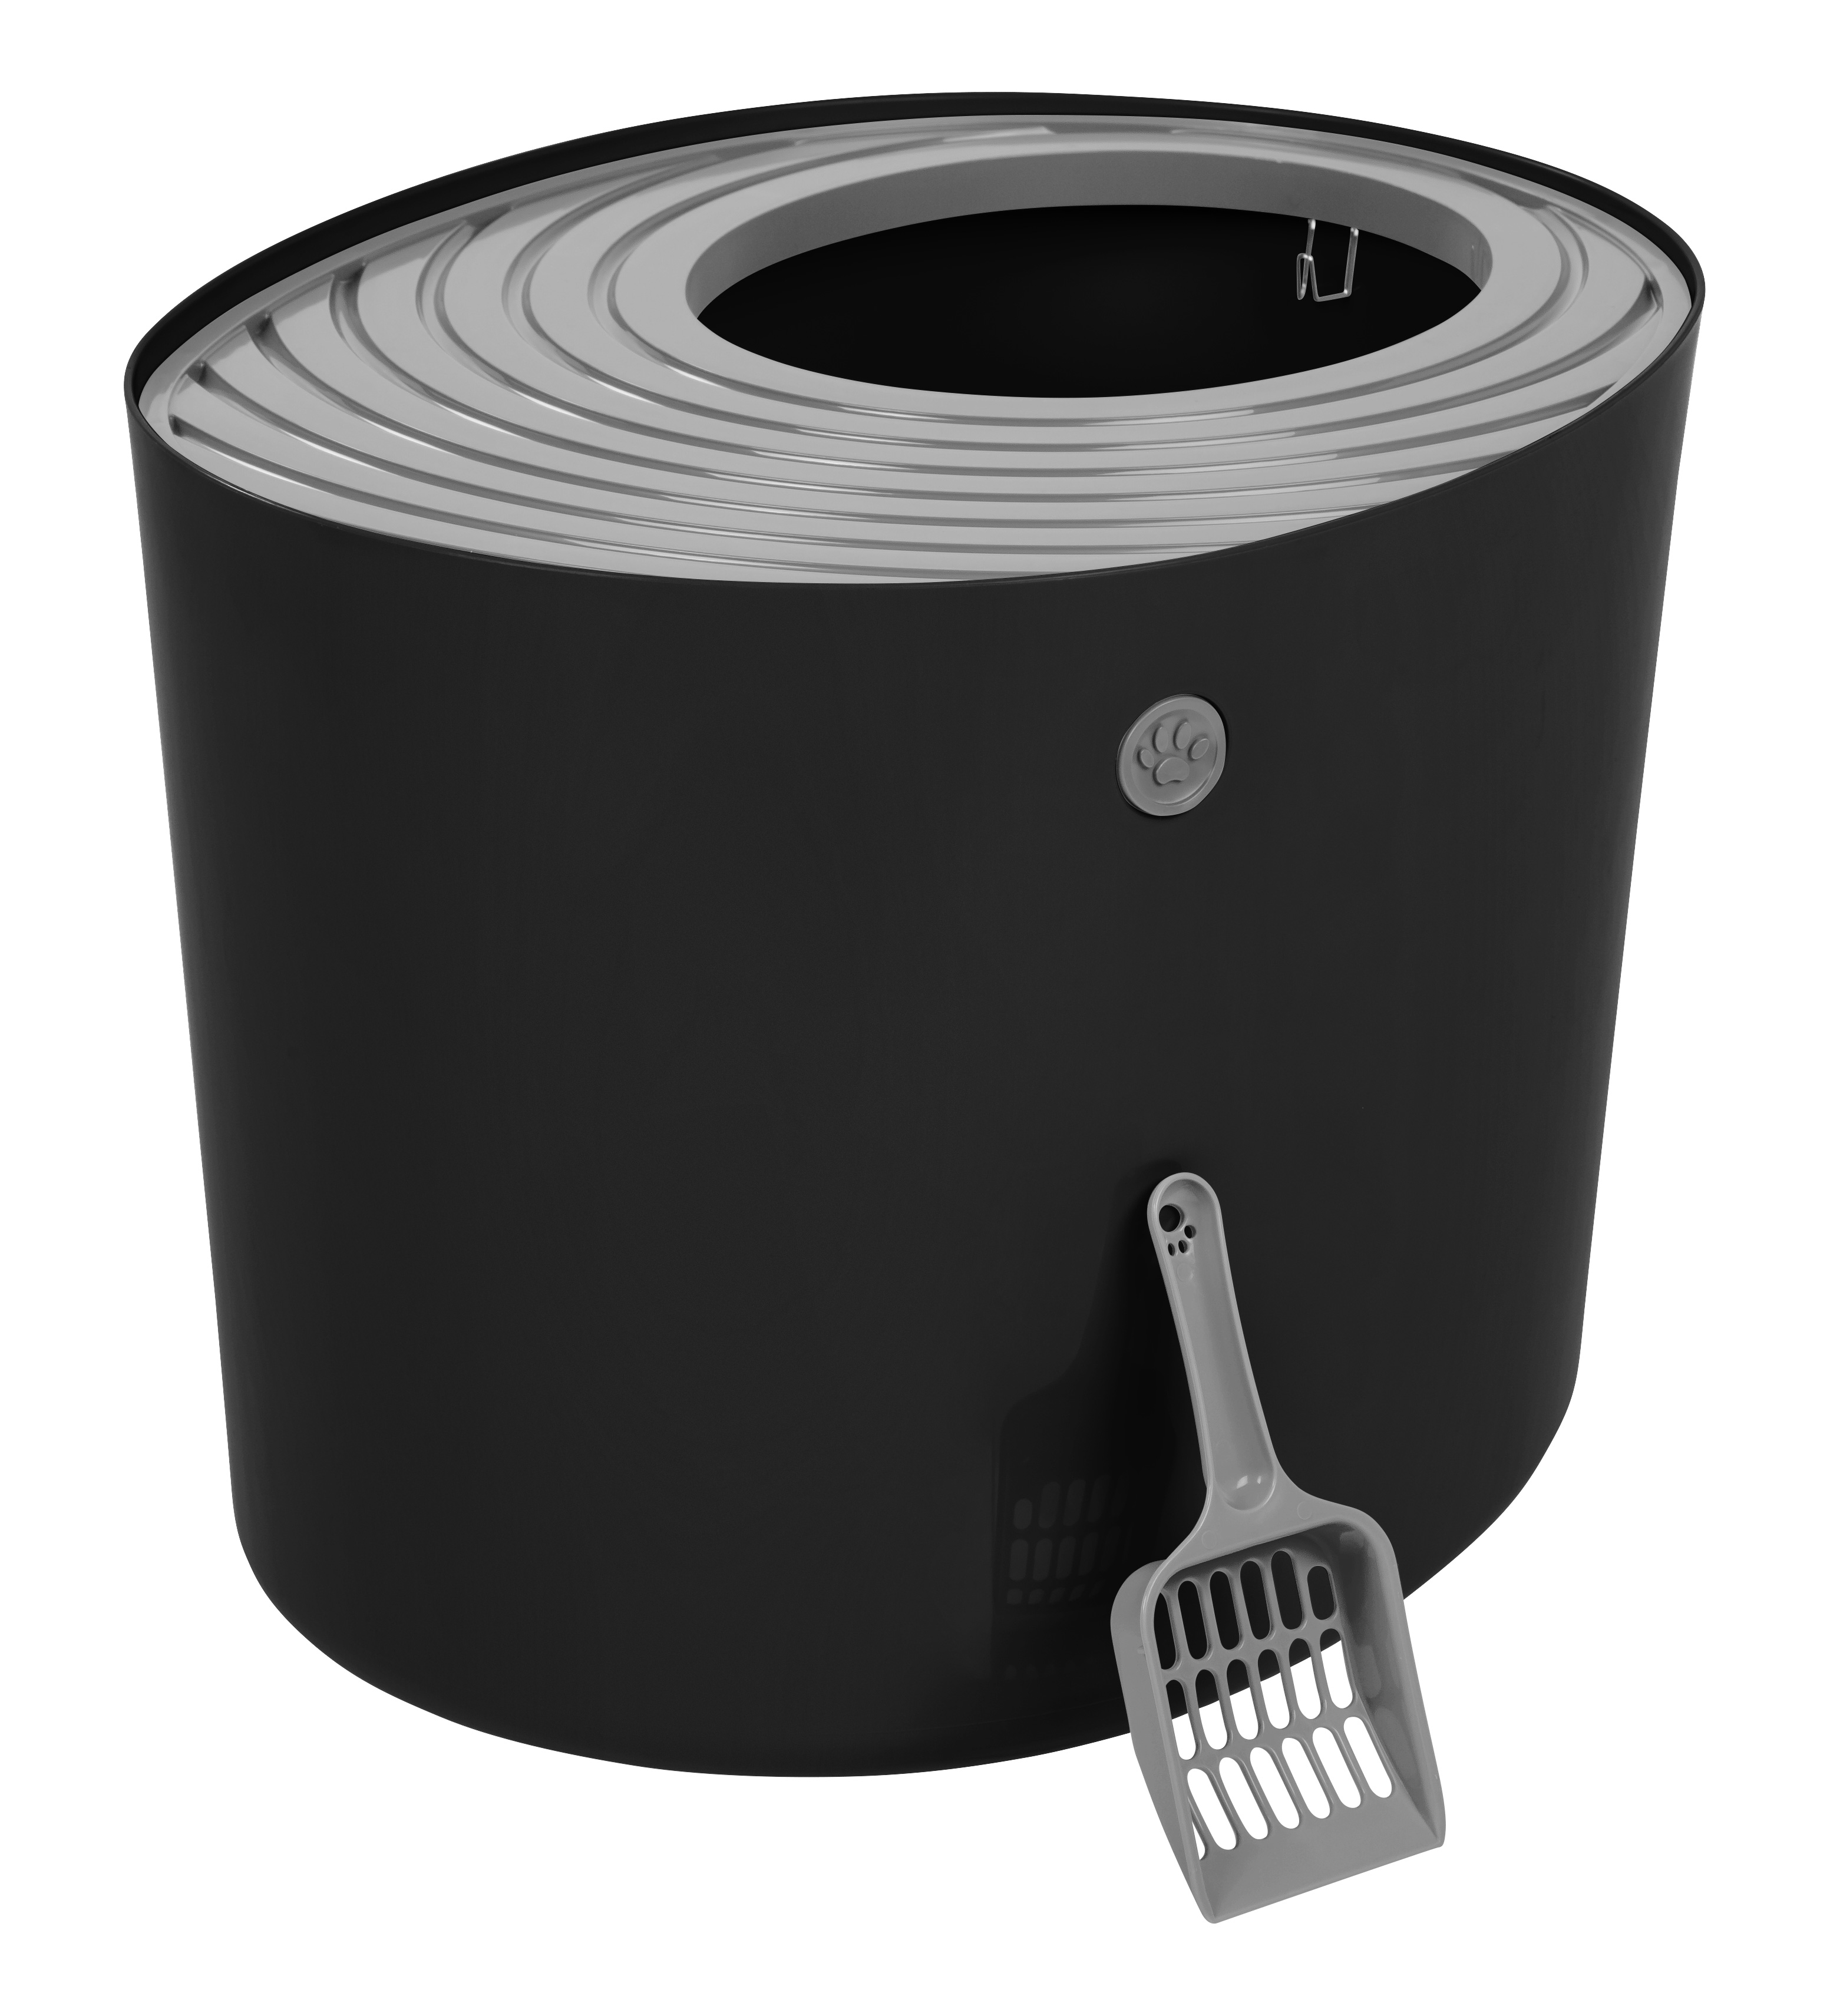 IRIS Top Entry Cat Litter Box, Black/Light Gray